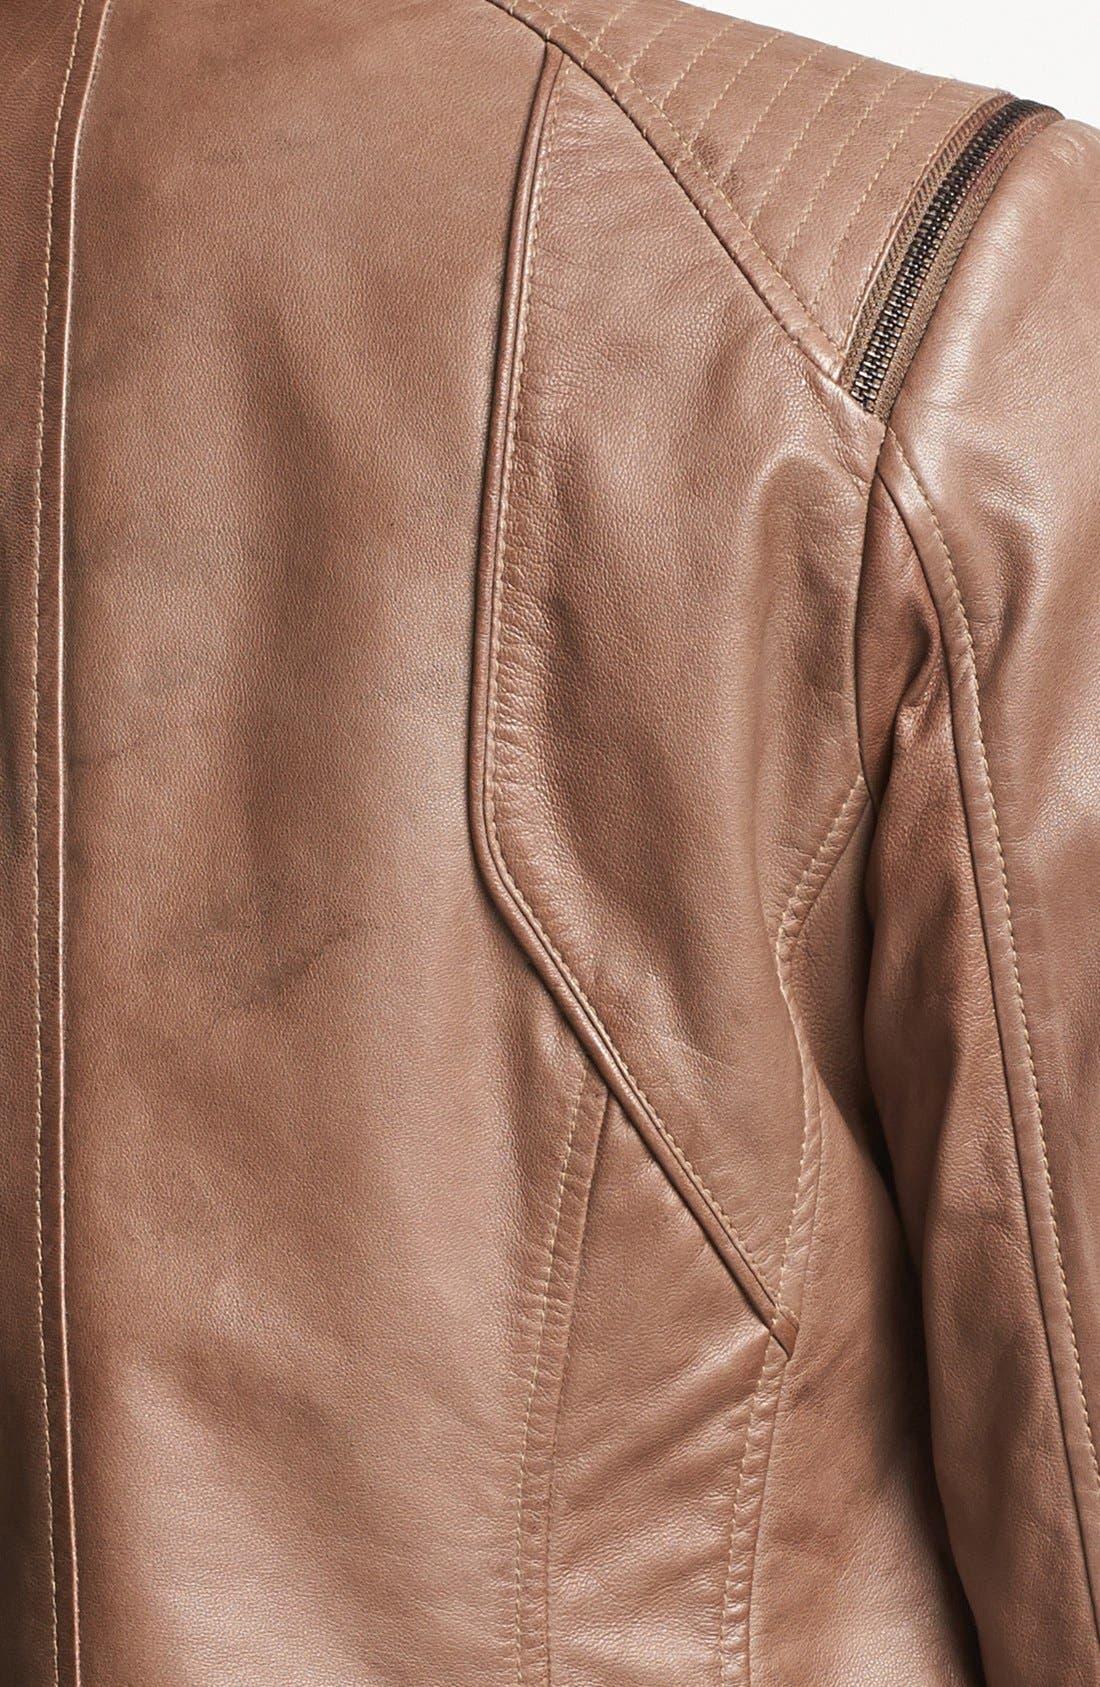 BERNARDO, Zip Trim Leather Scuba Jacket, Alternate thumbnail 2, color, 270